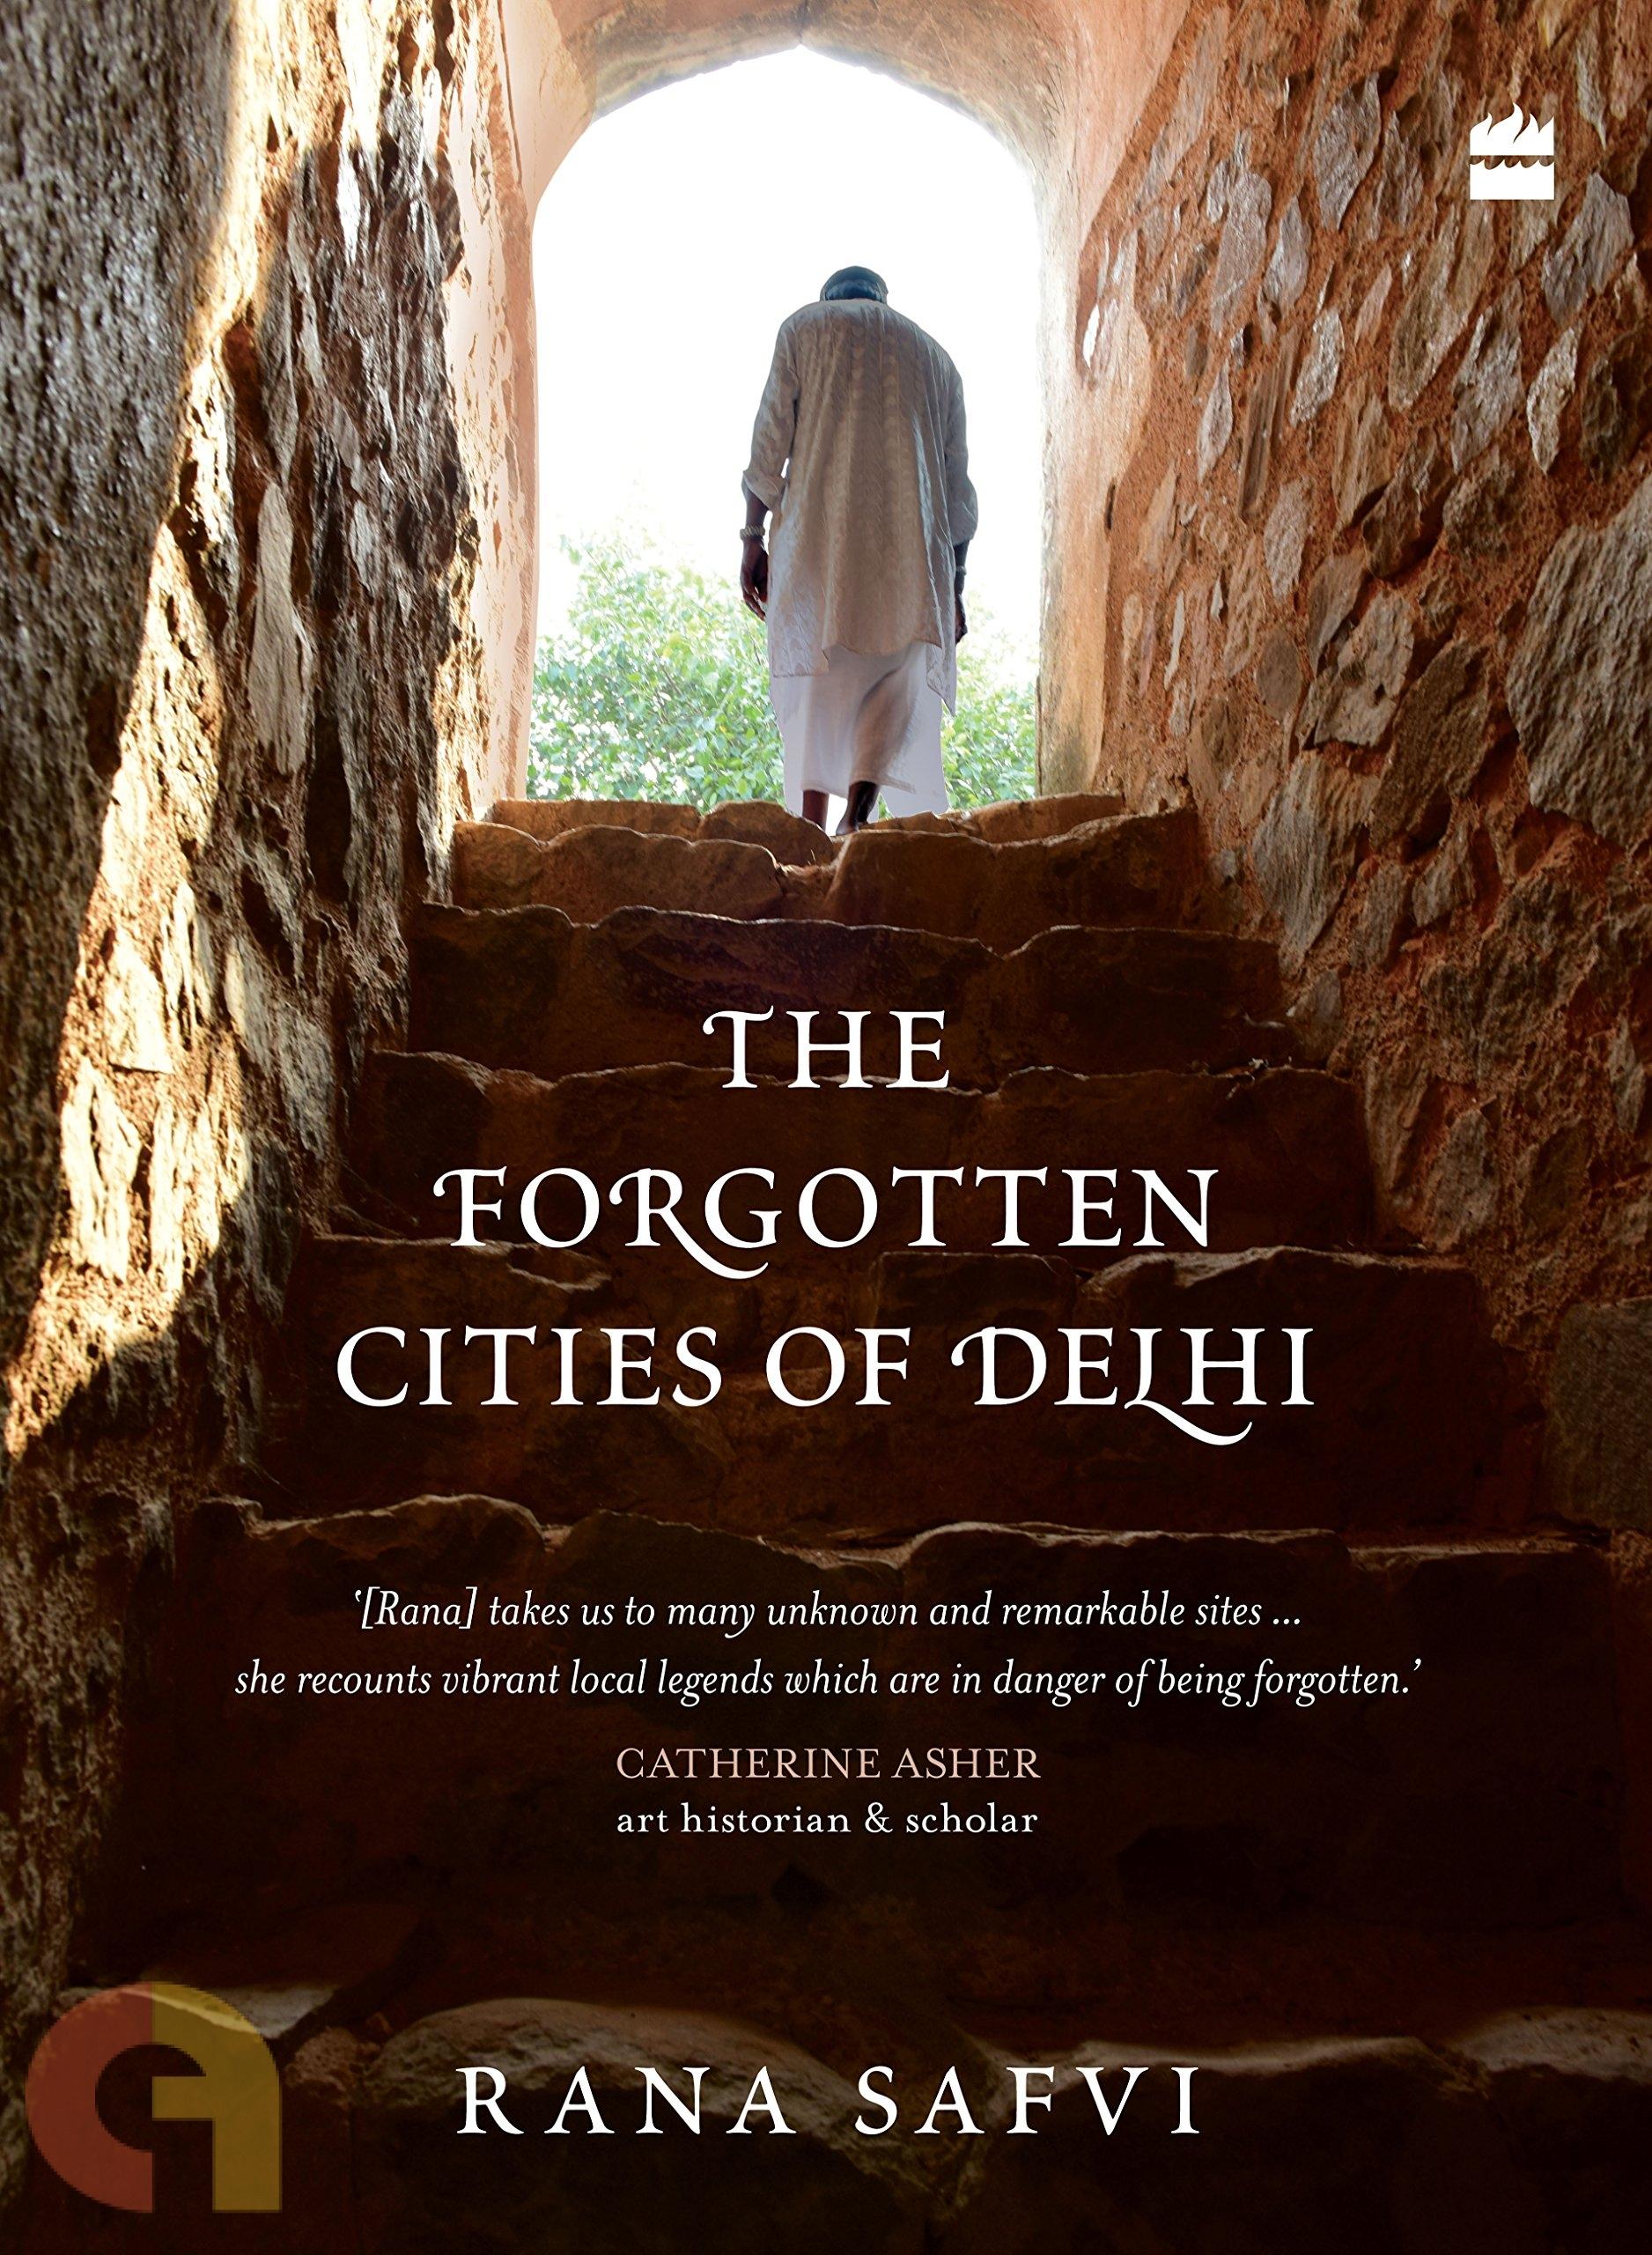 The Forgotten Cities of Delhi